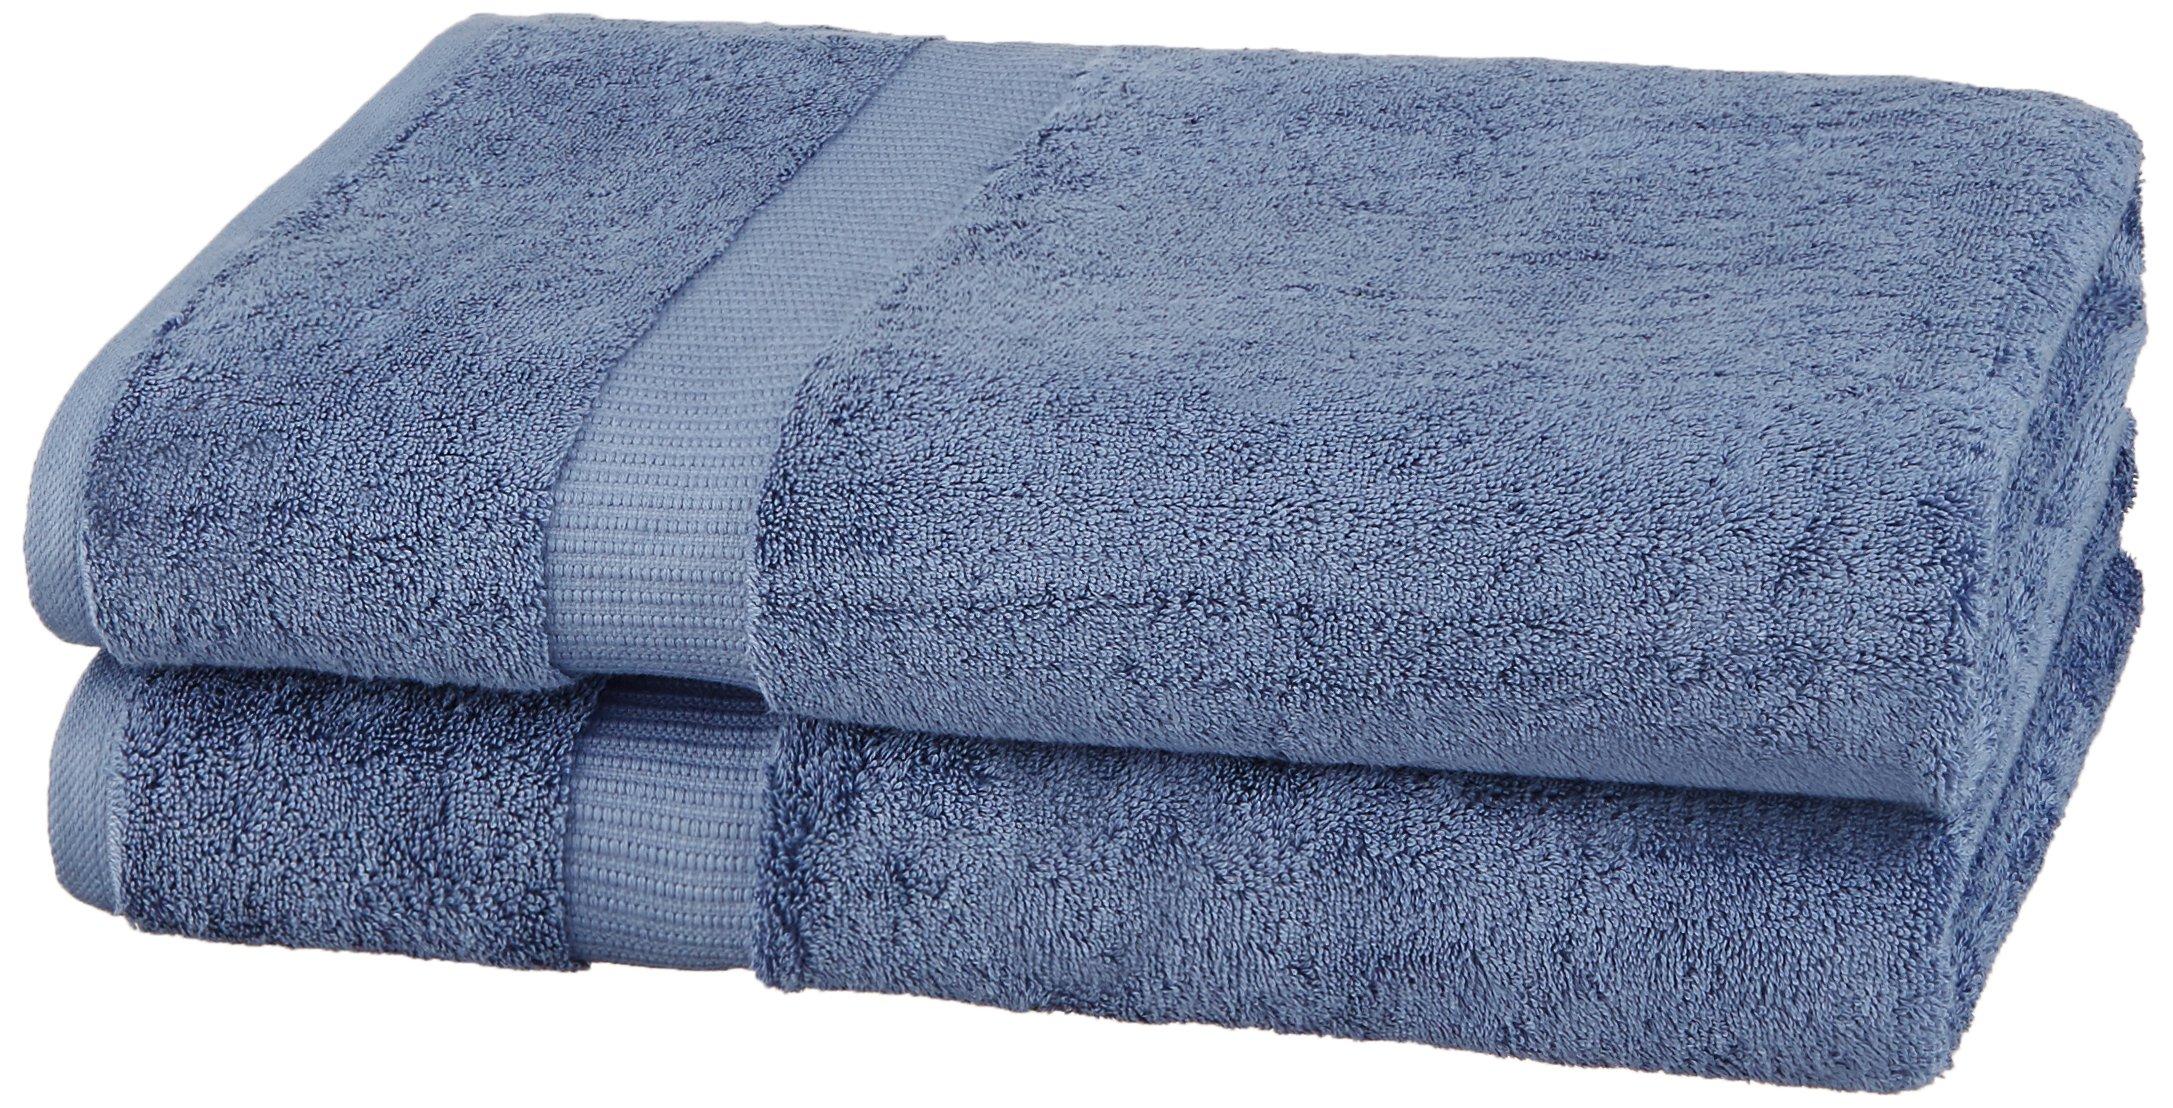 Pinzon Organic Cotton Bath Sheet (2 Pack), Indigo Blue